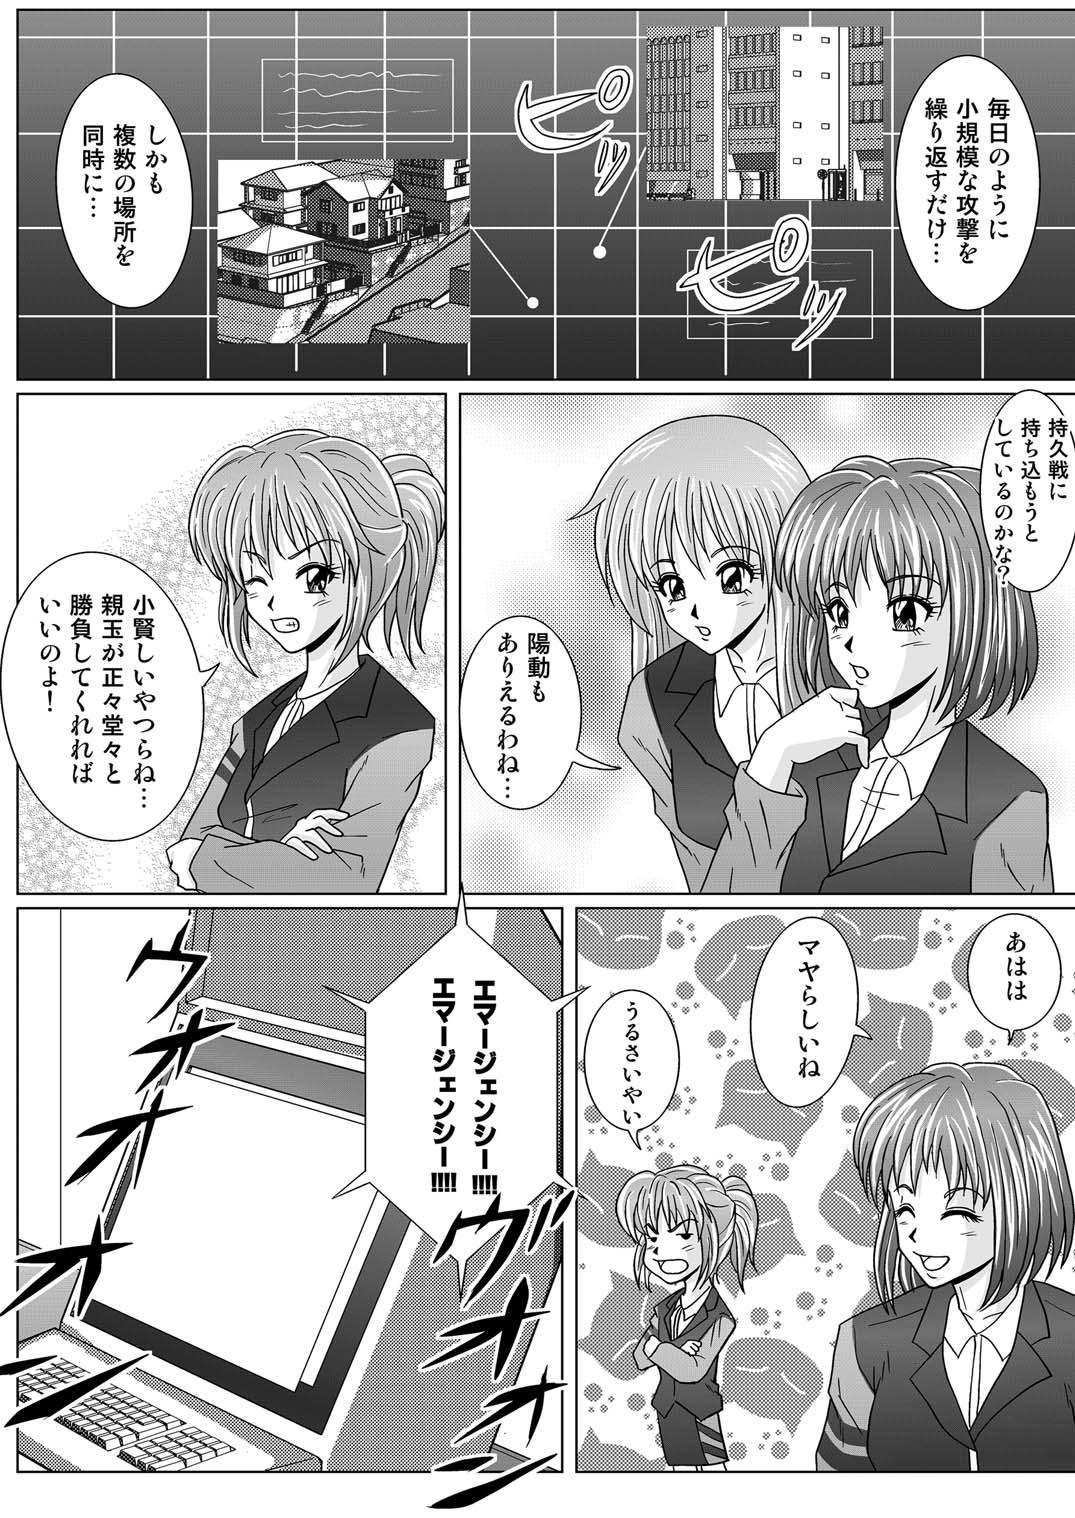 [Macxe's (monmon)] Tokubousentai Dinaranger ~Heroine Kairaku Sennou Keikaku~ Vol.01/02/03 (Renkaban) [Digital] 8